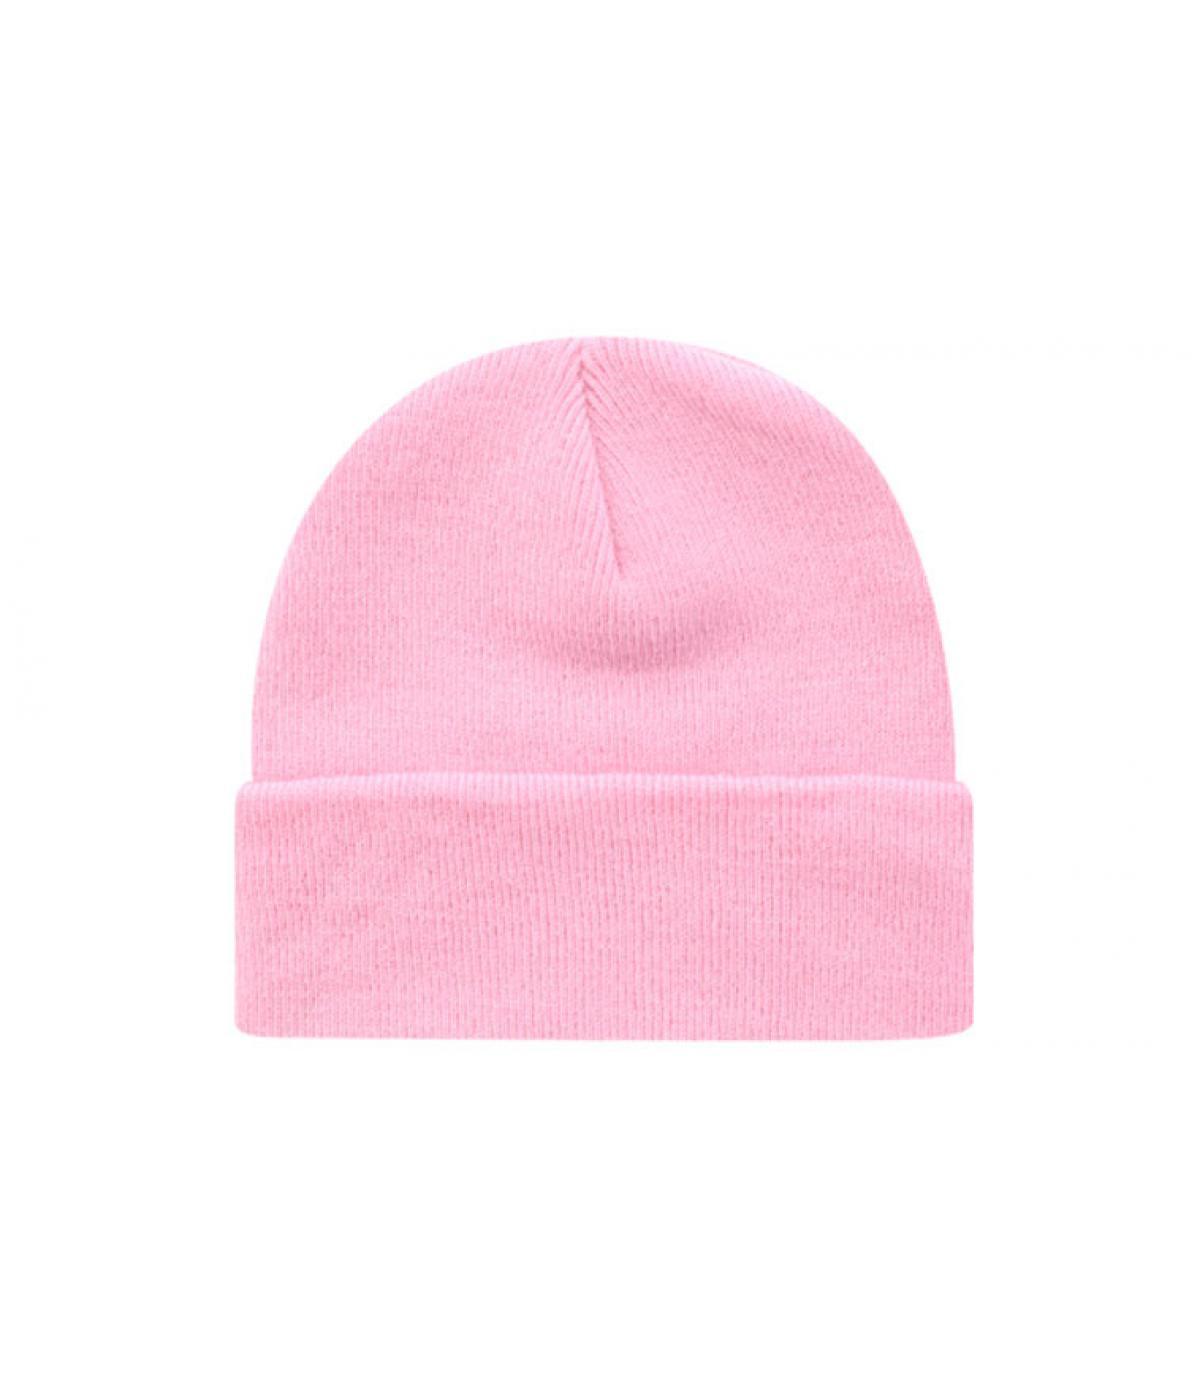 Bonnet blank pink